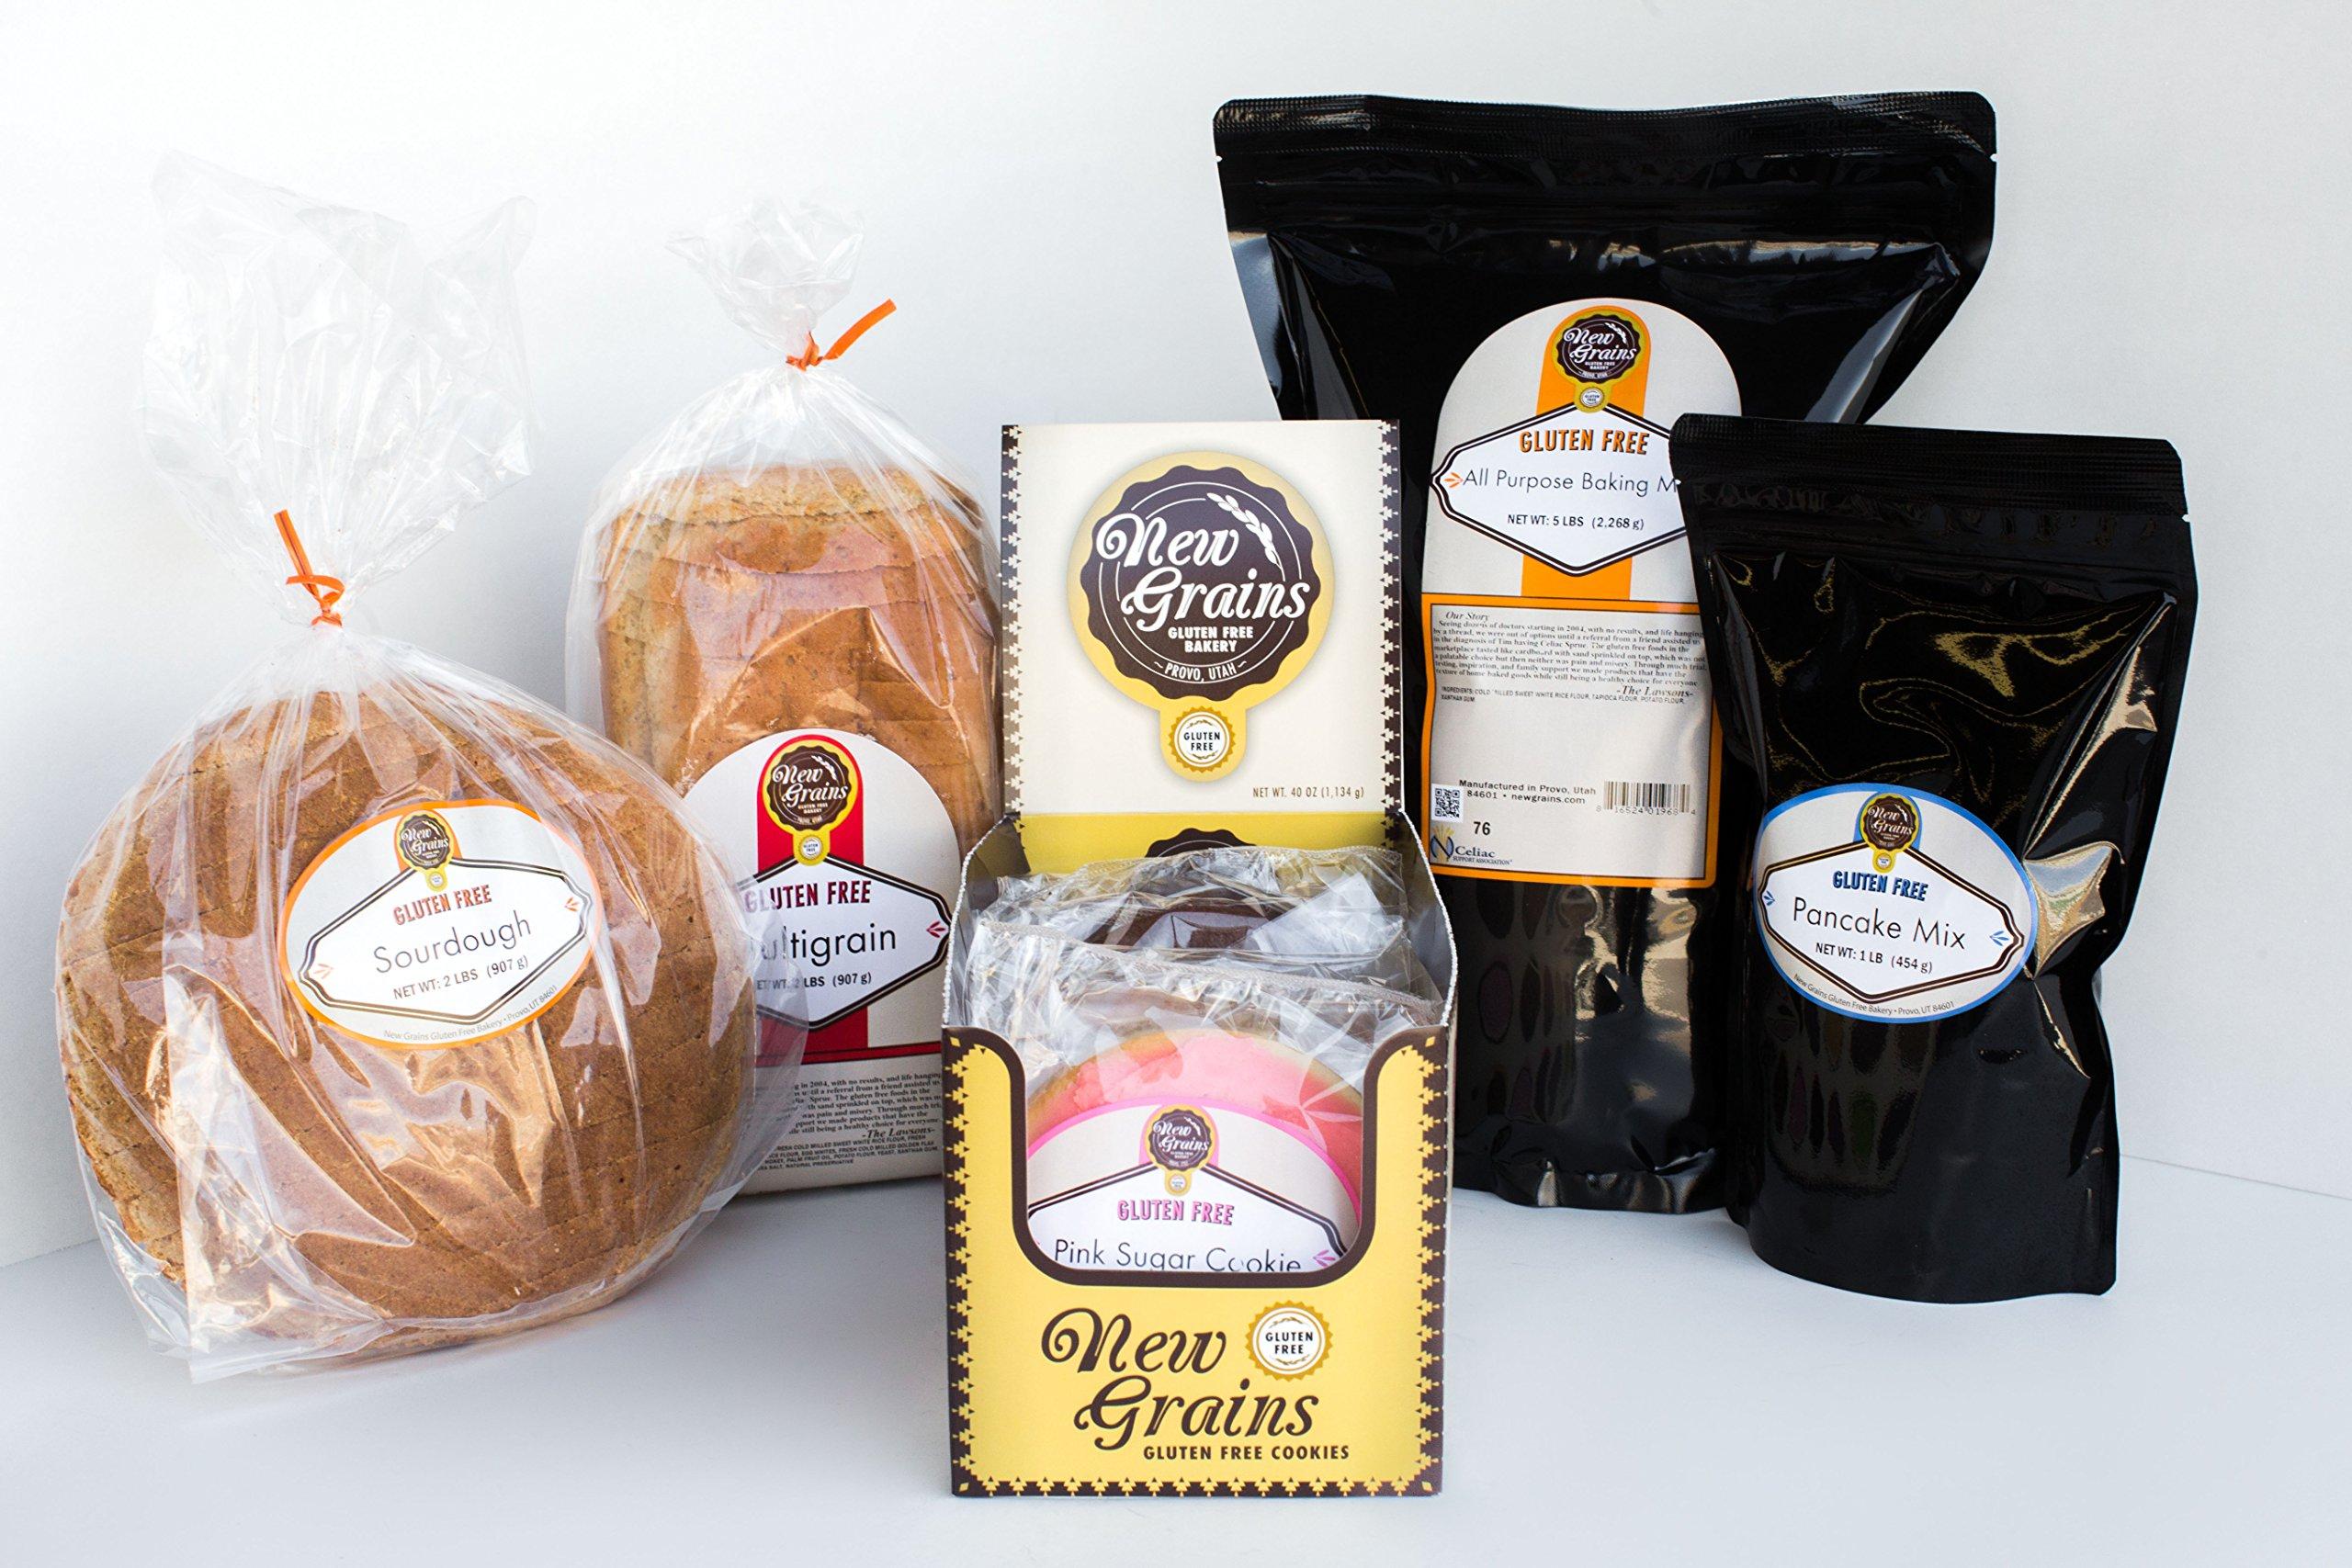 New Grains Gluten Free Large Sampler Pack - Care Package (Multigrain Bread, Sourdough Bread, 10 Cookies, Waffle/Pancake Mix, All-Purpose Flour)